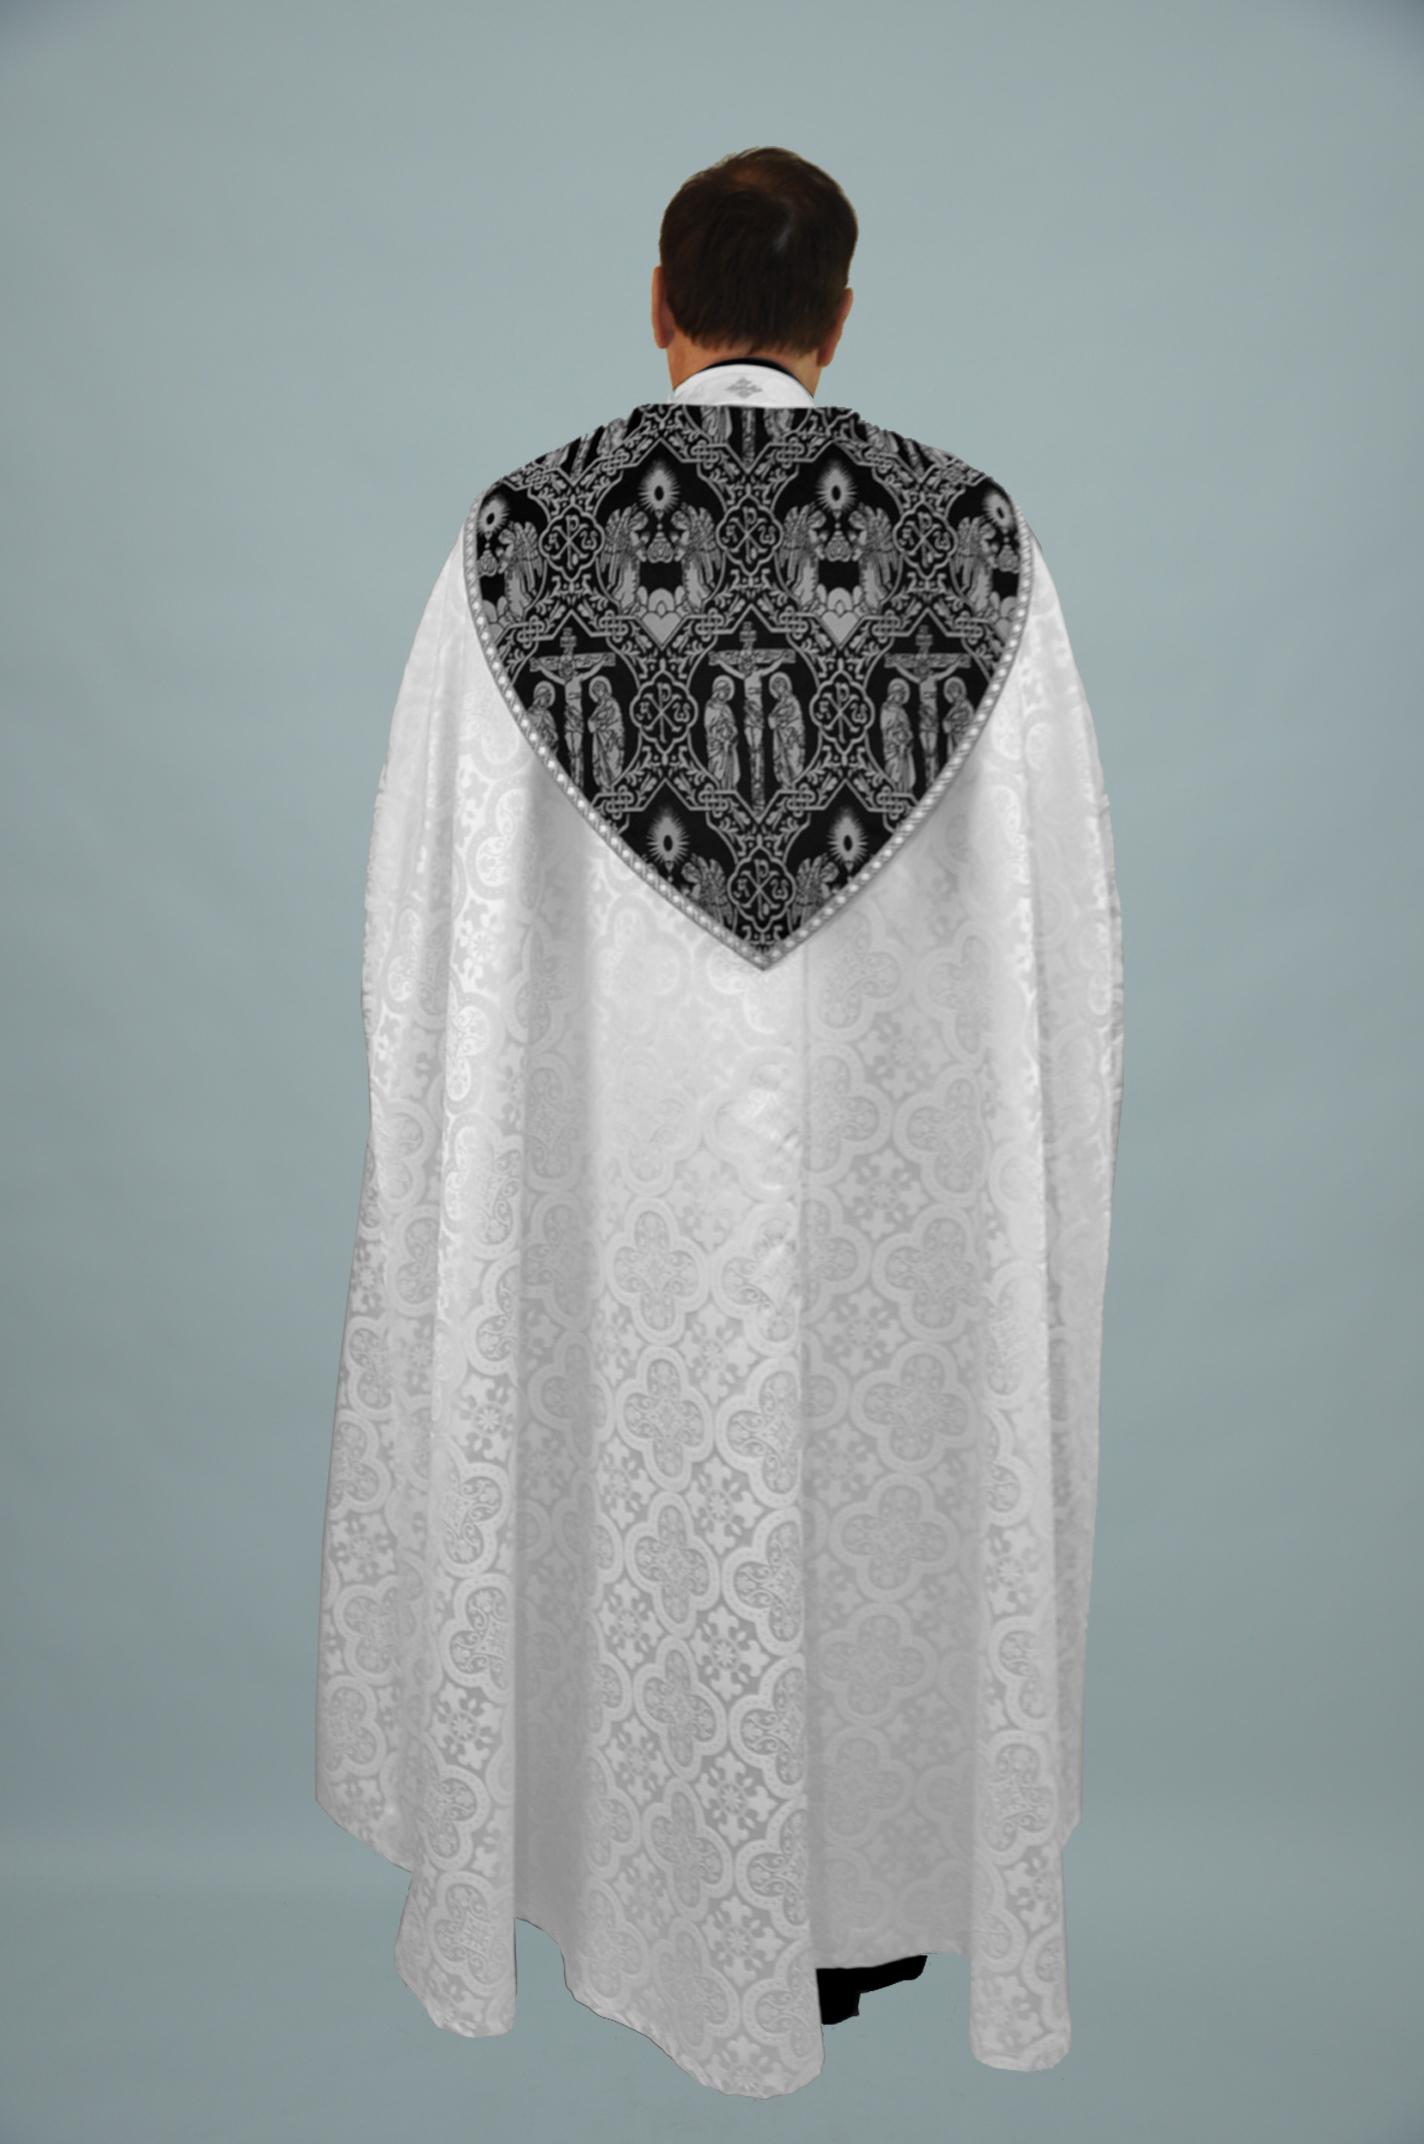 M2 Cope Trinity White w Crucifixion black silver & 2326 silver (b) 1.jpg